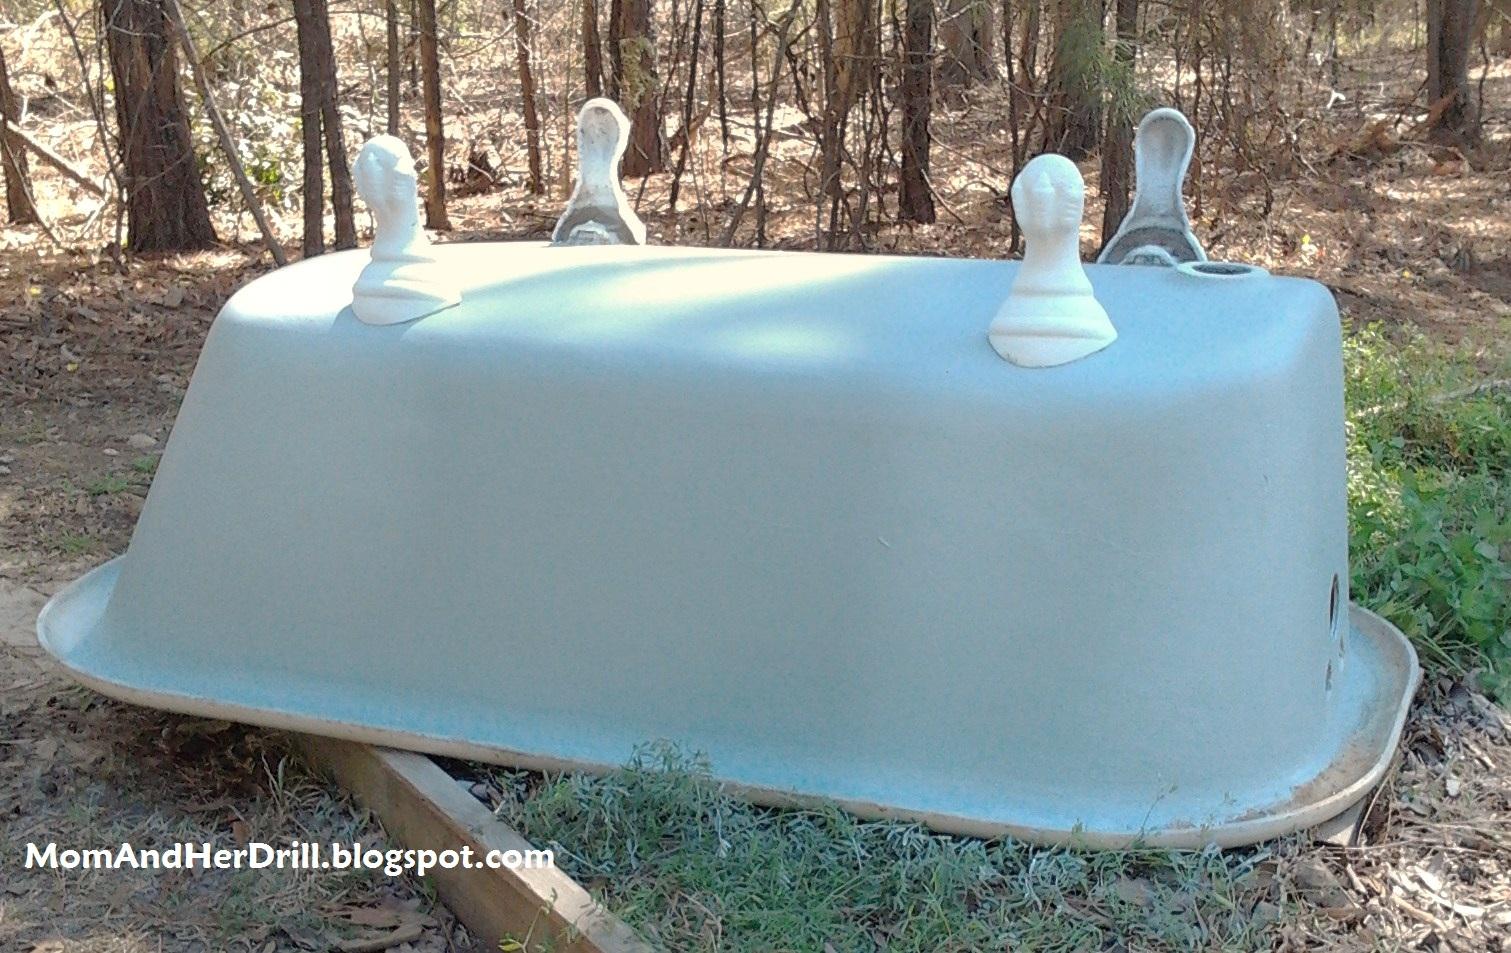 Refinishing Porcelain Bathtubs Amp Sinks Part 2 Mom And